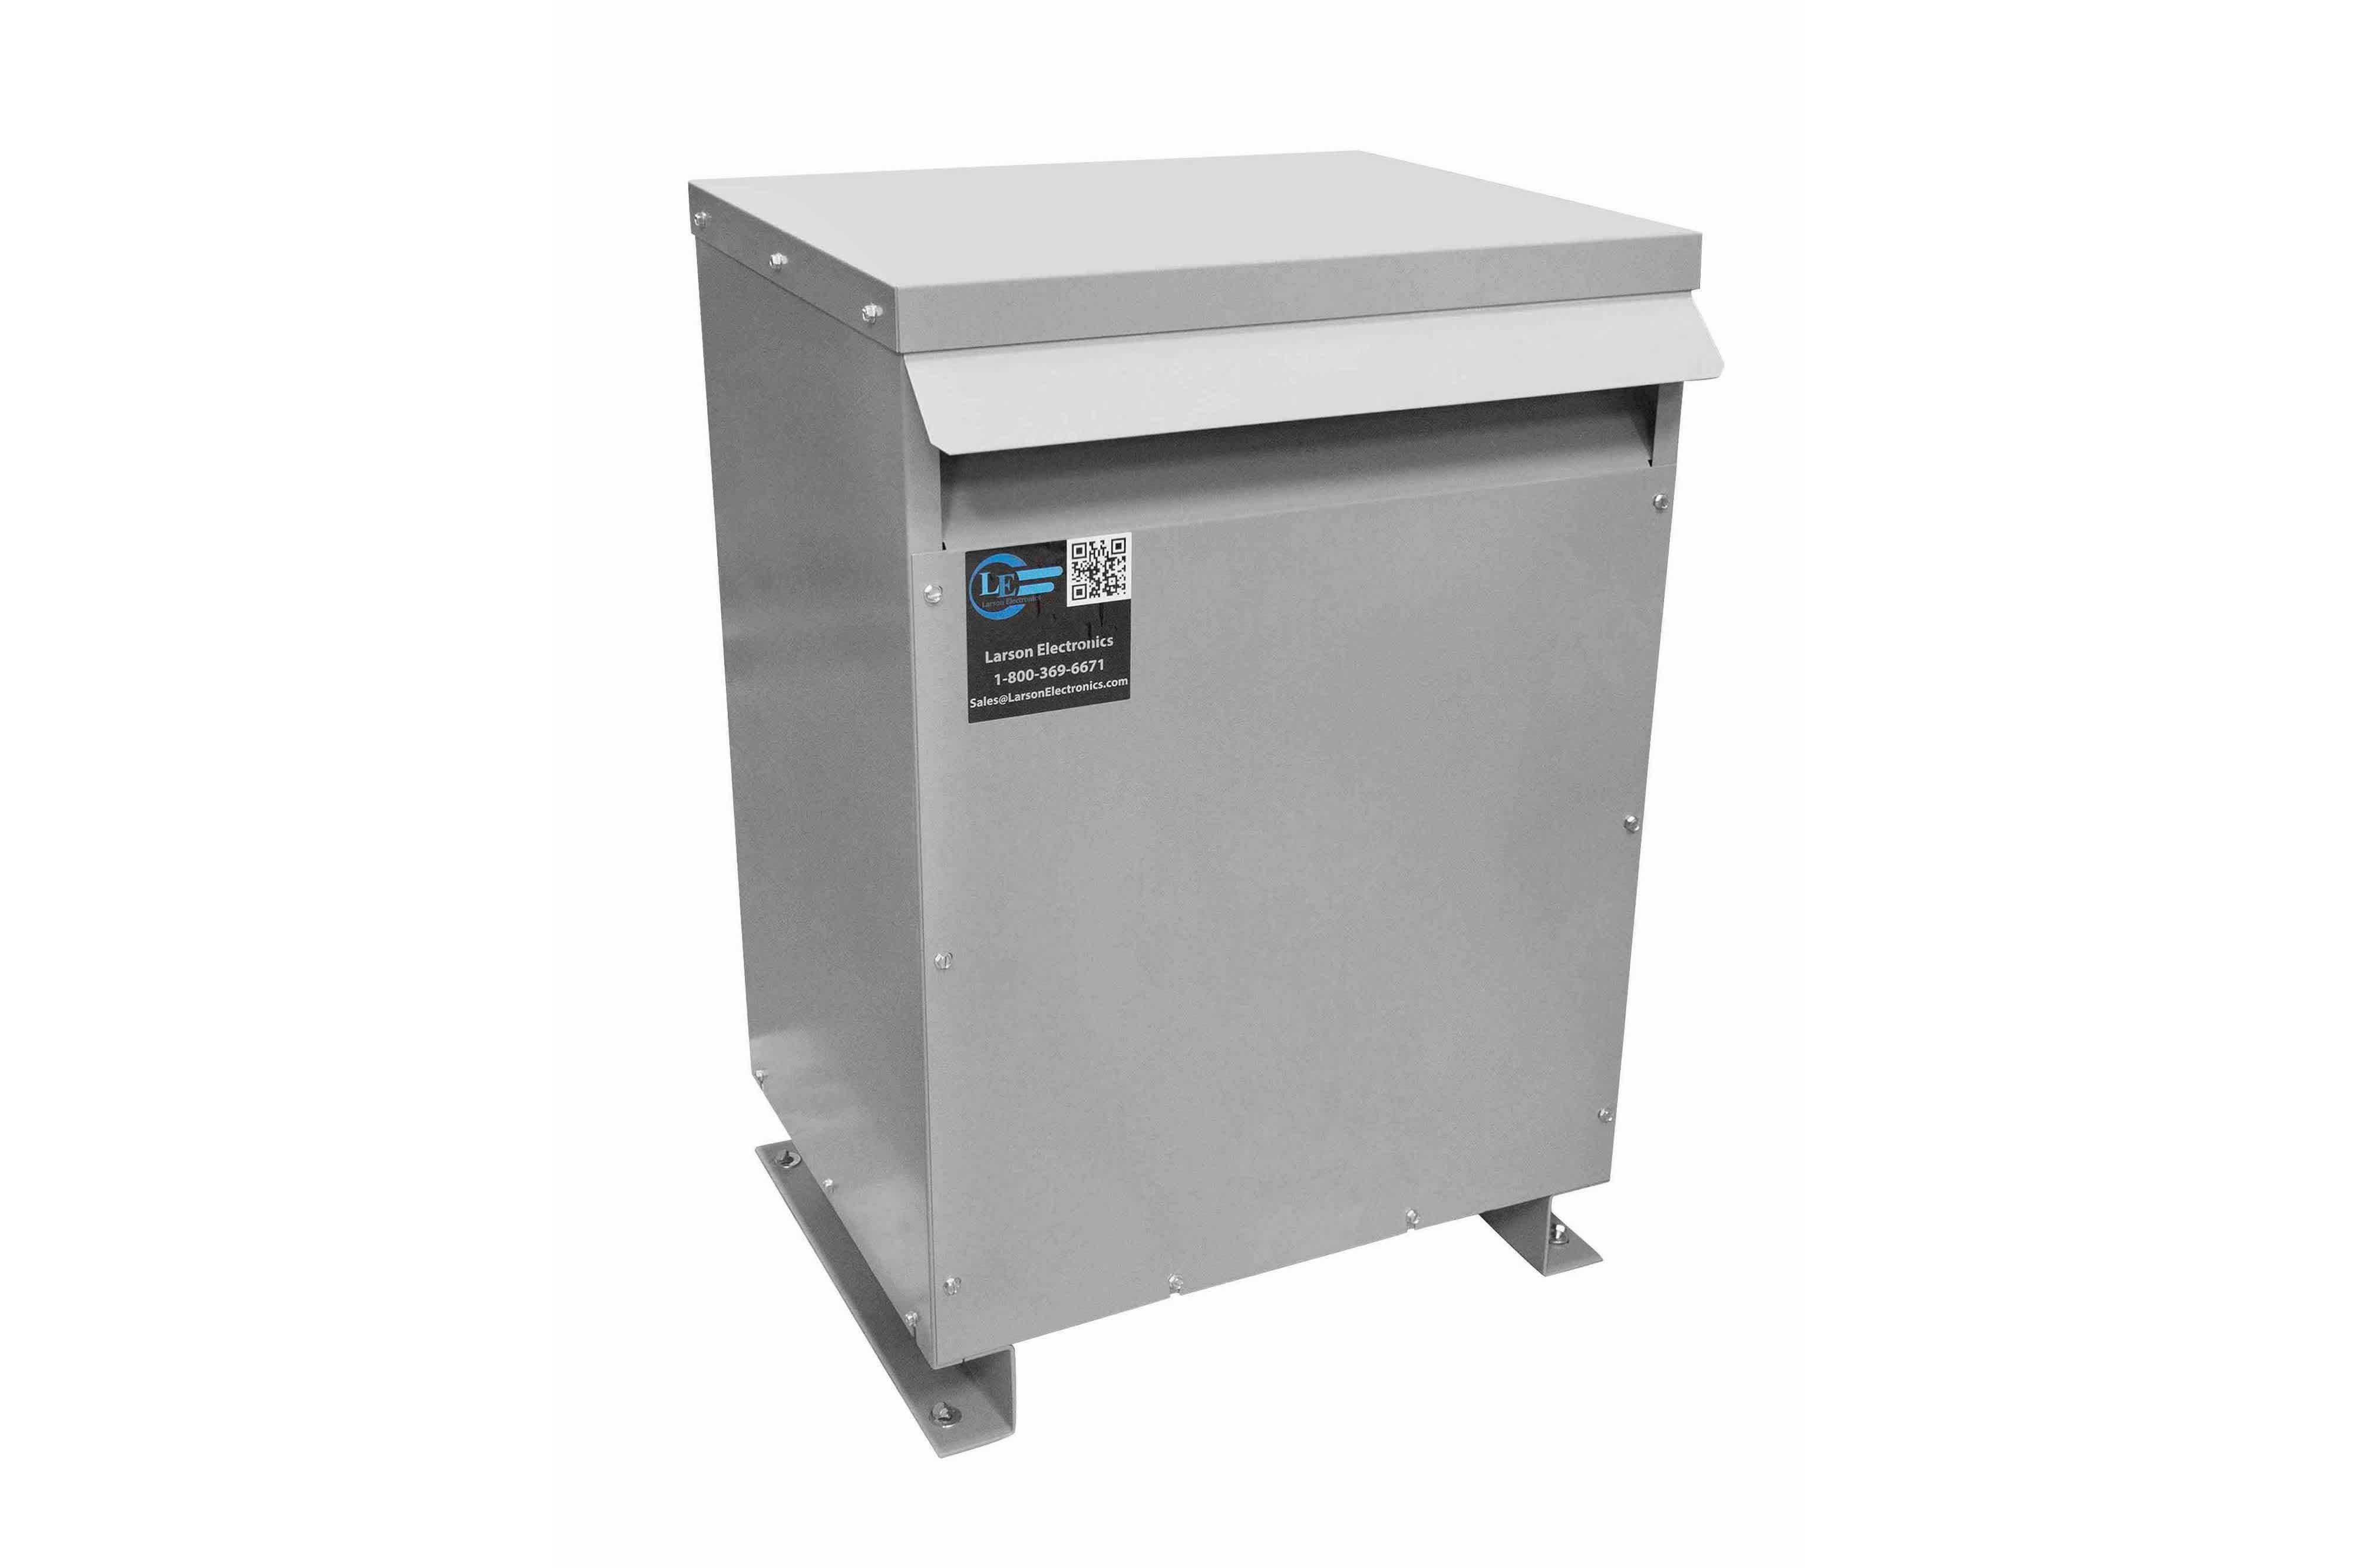 65 kVA 3PH Isolation Transformer, 400V Wye Primary, 600Y/347 Wye-N Secondary, N3R, Ventilated, 60 Hz